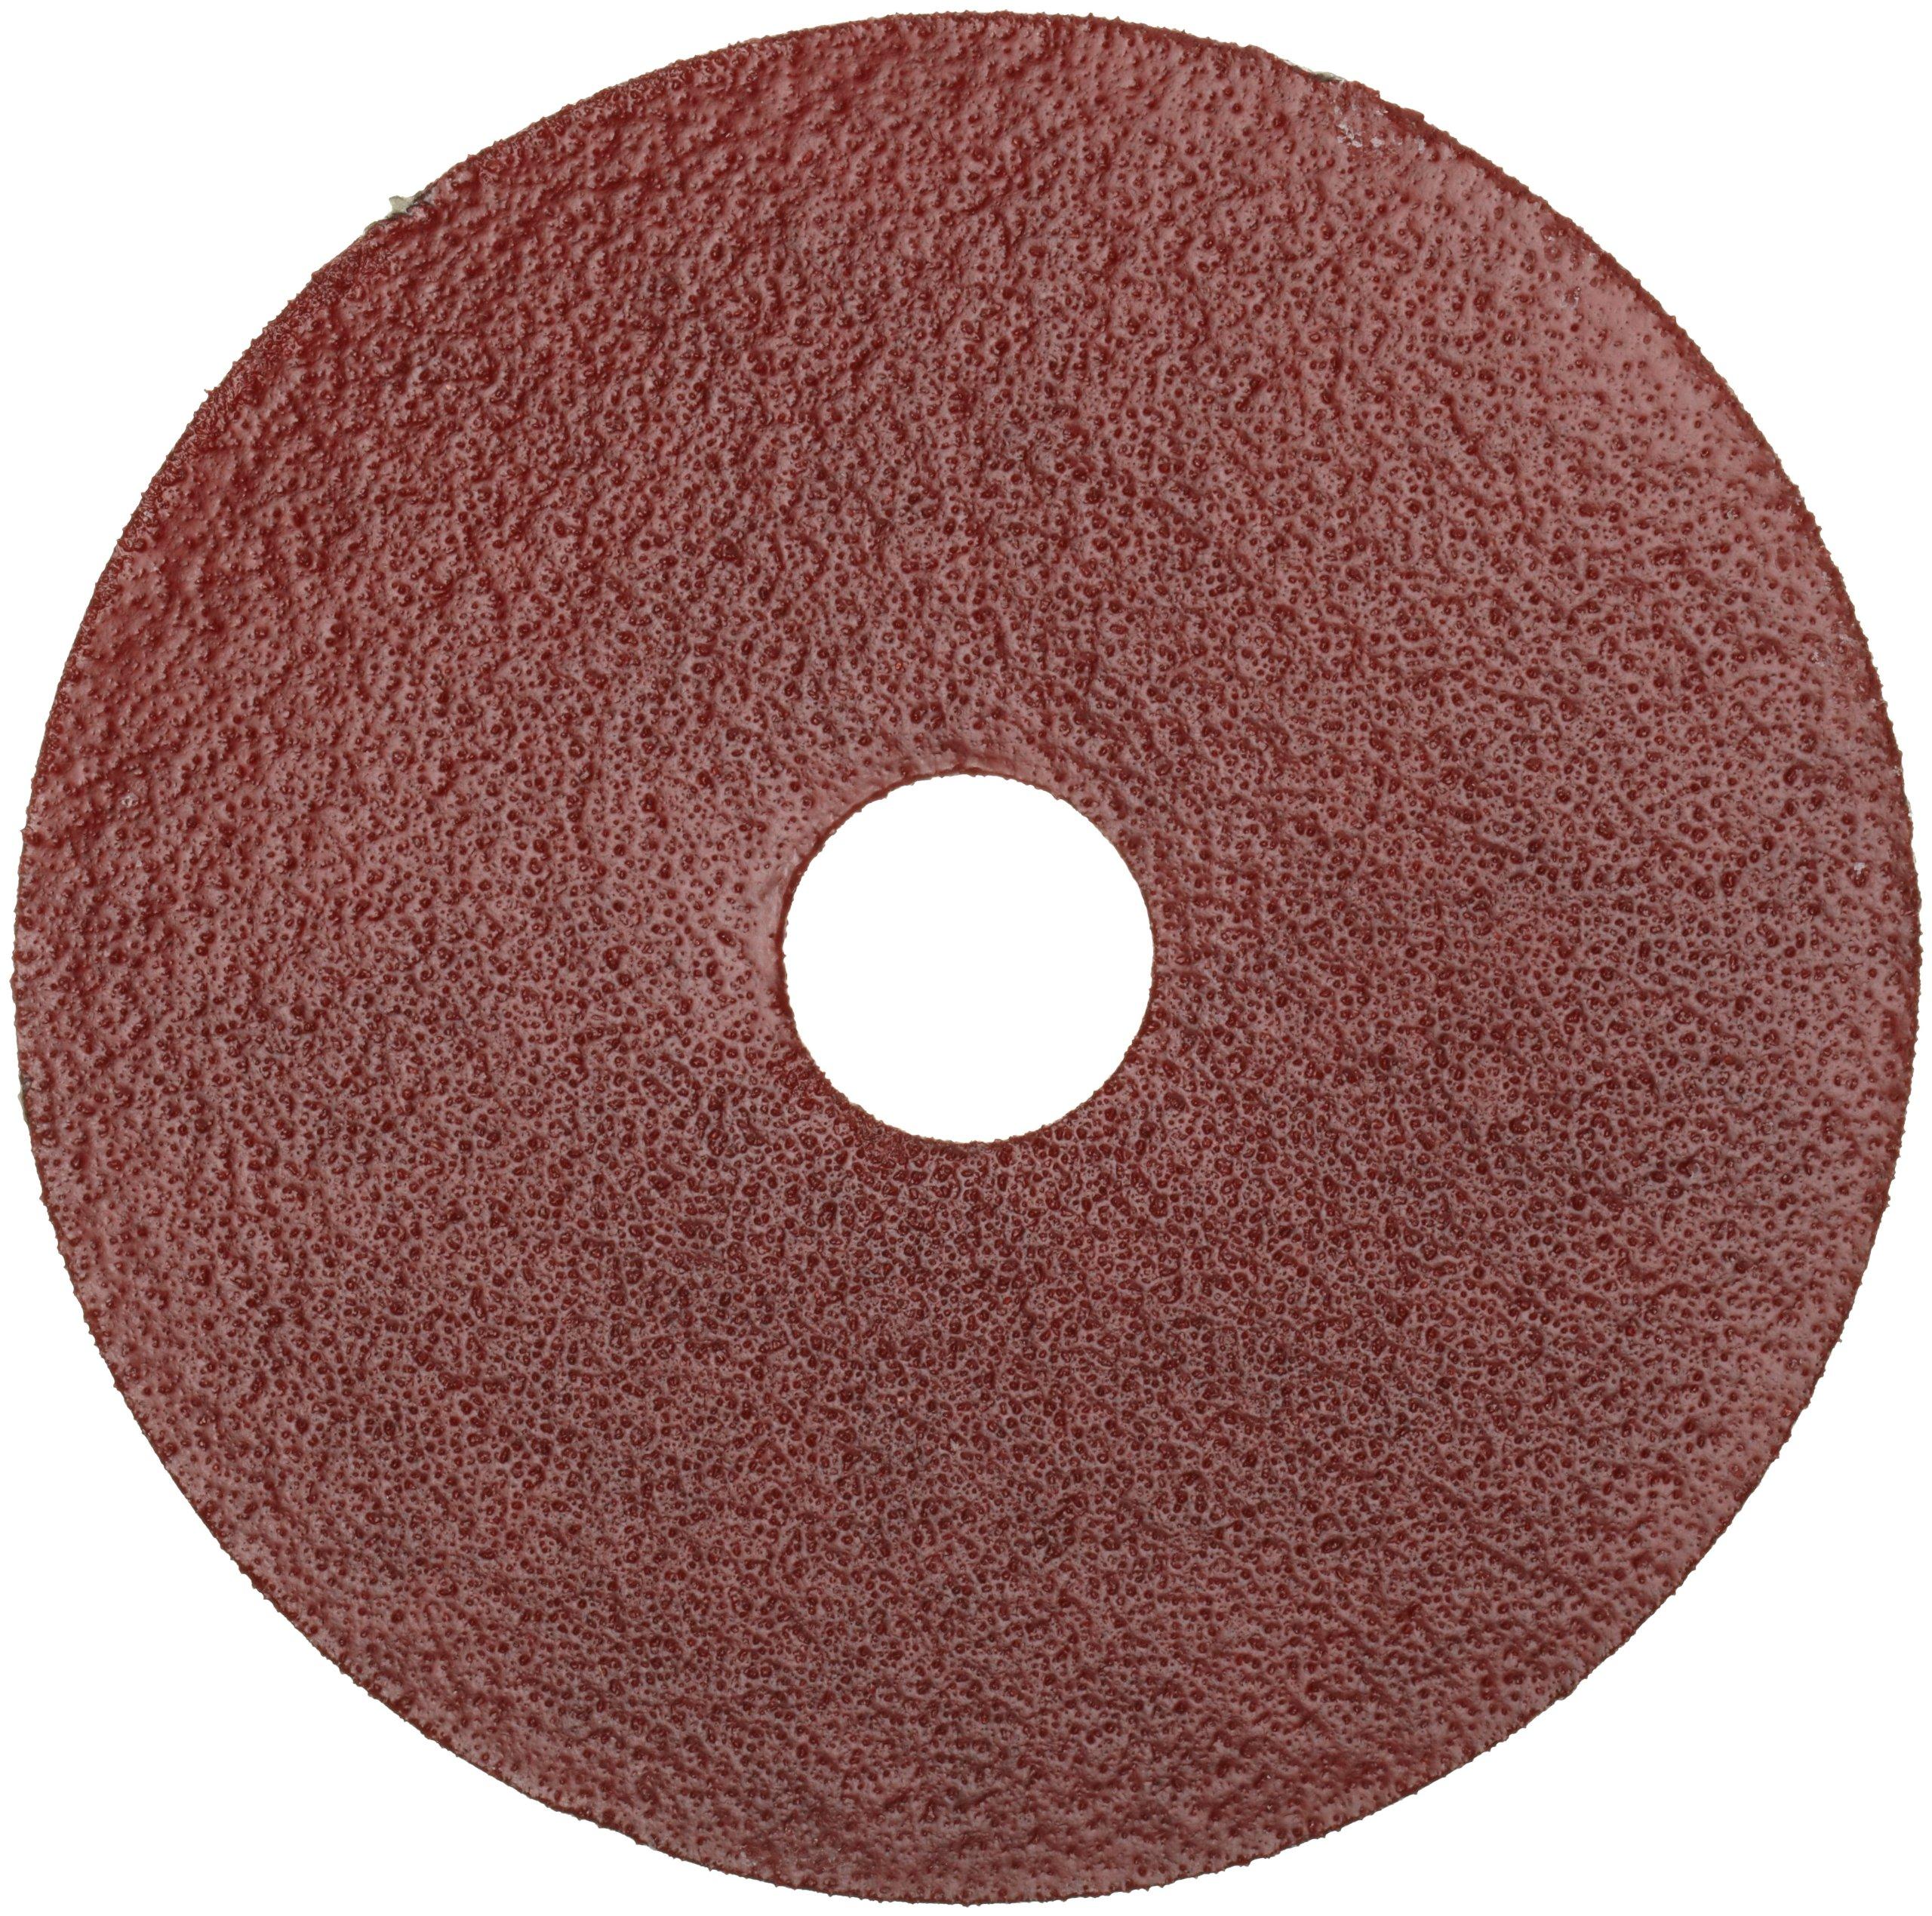 Norton Gemini Metalite F220 Abrasive Disc, Fiber Backing, Aluminum Oxide, 7/8'' Arbor, 7'' Diameter, Grit 24 (Pack of 25)